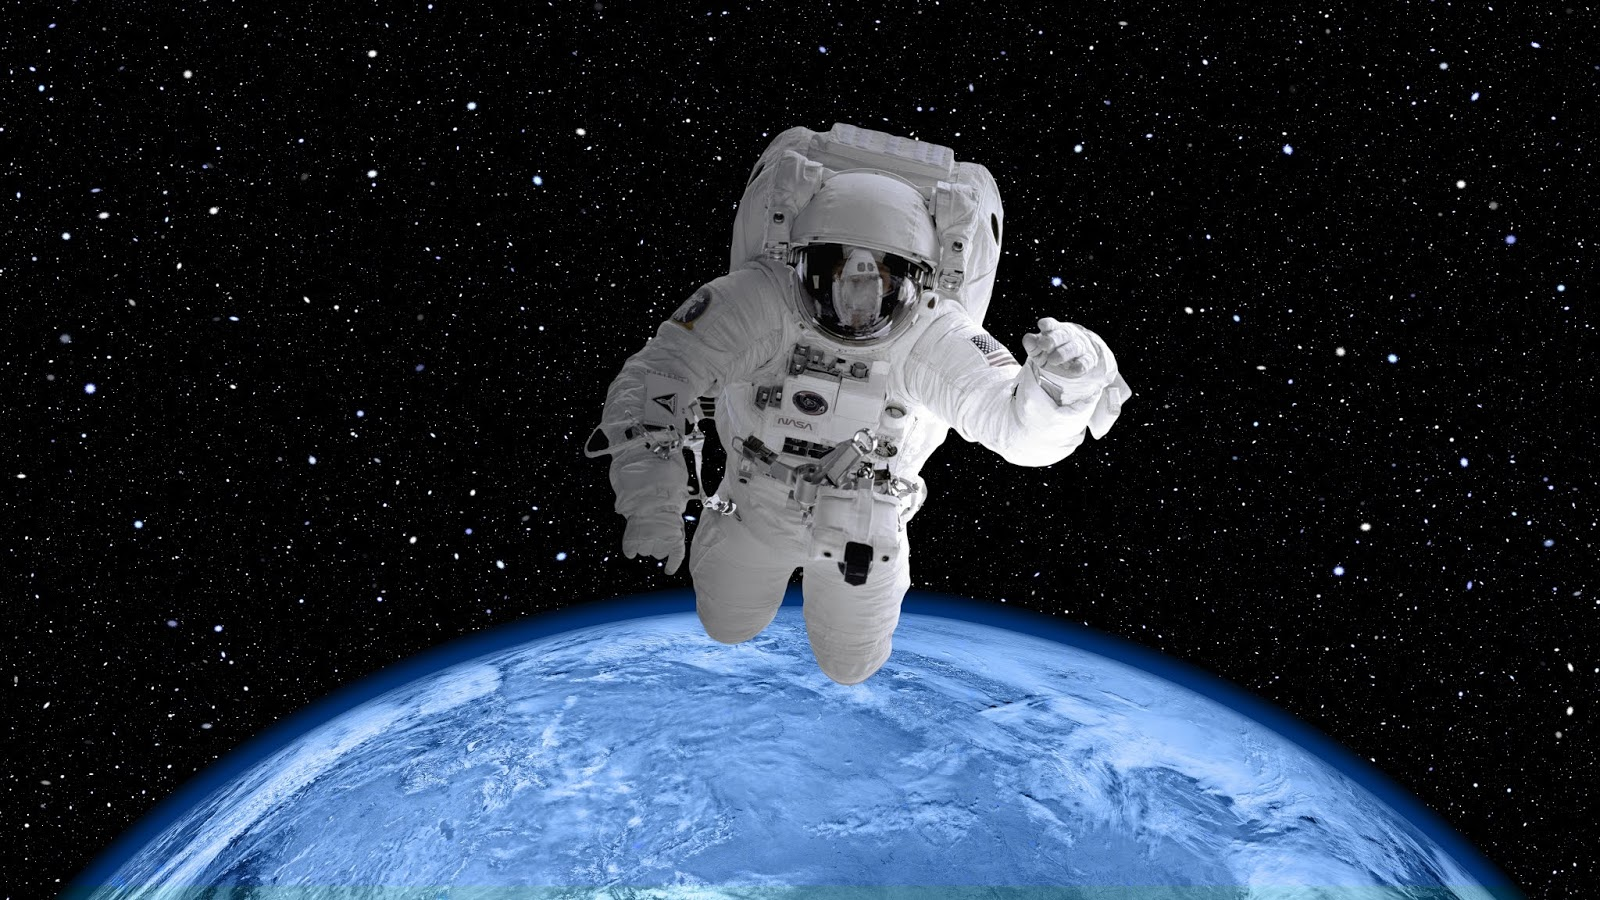 Astronaut, Earth, Orbit, Space Suit, 4K, 8K